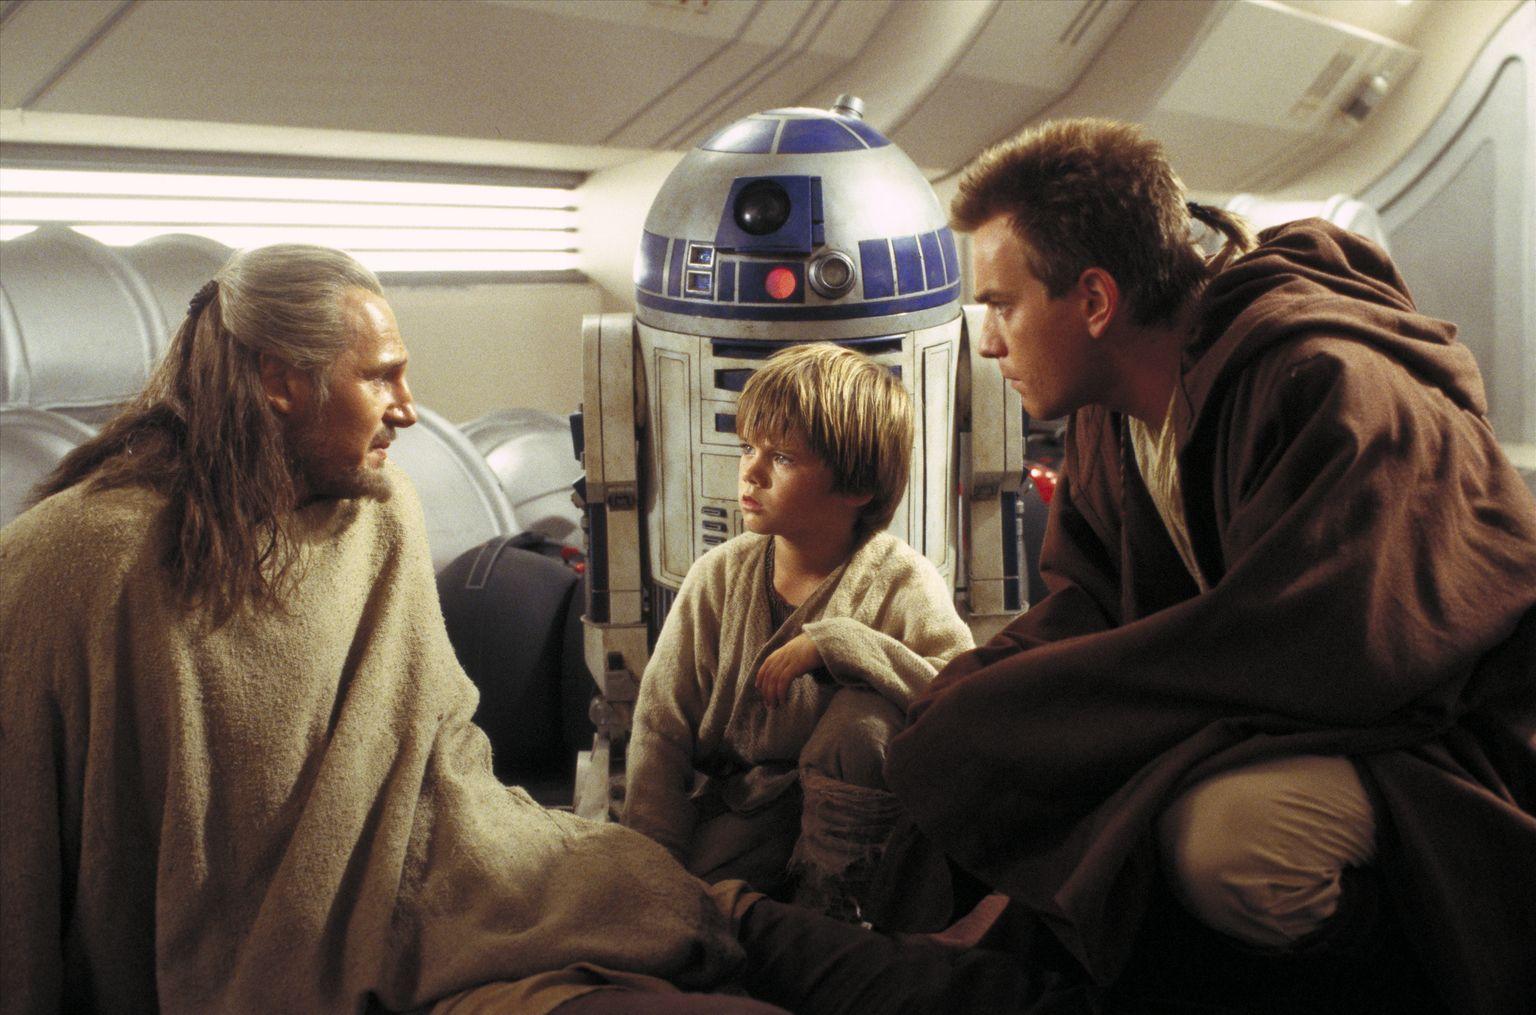 Star Wars: Episode I - The Phantom Menace (1999).